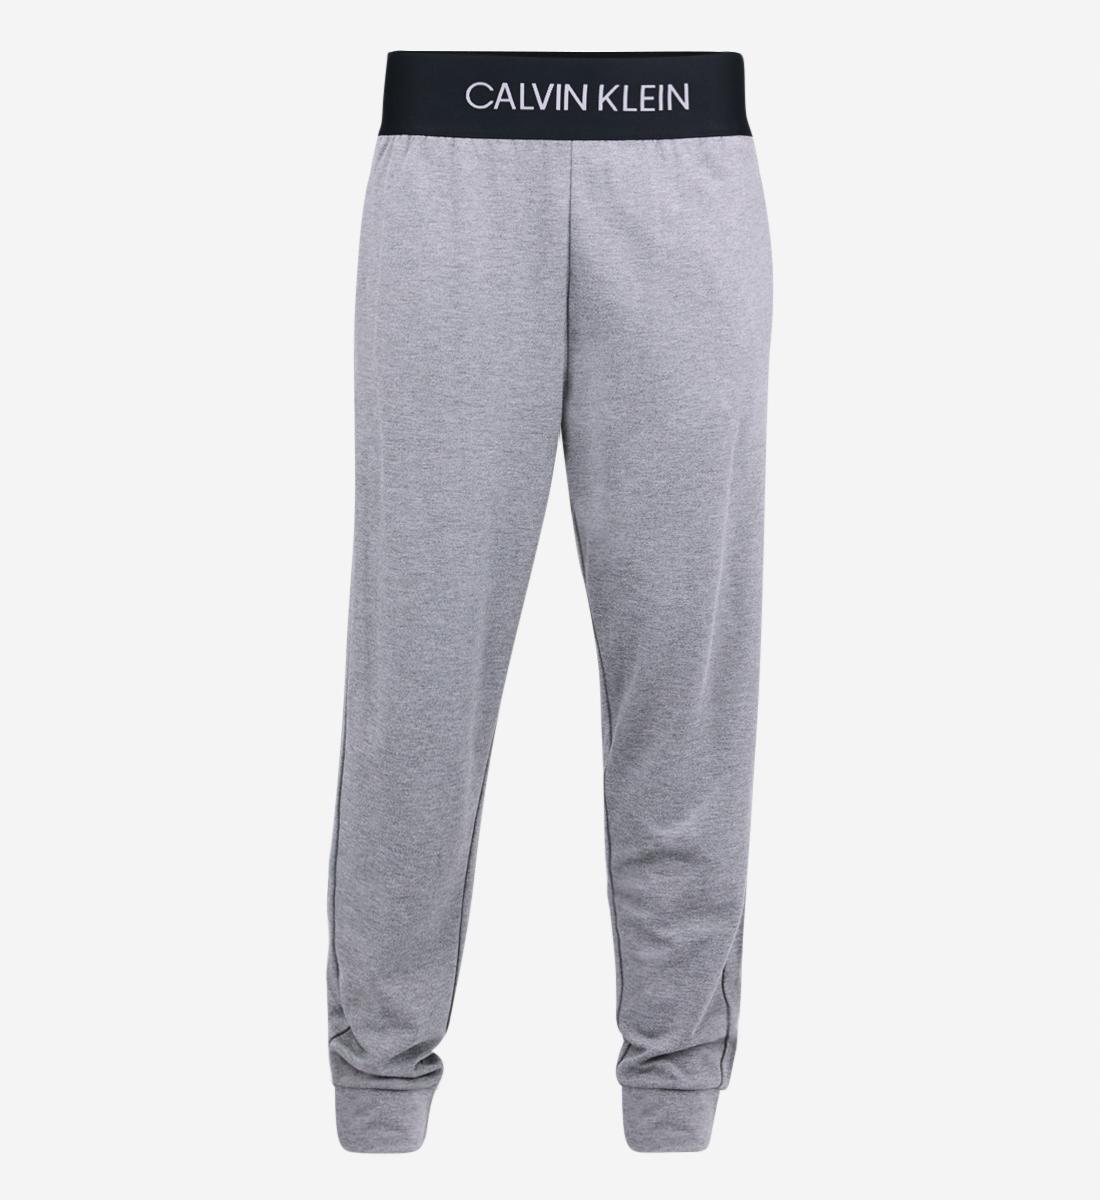 CK CALVIN KLEIN ORYGINALNE SPODNIE DRESOWE M